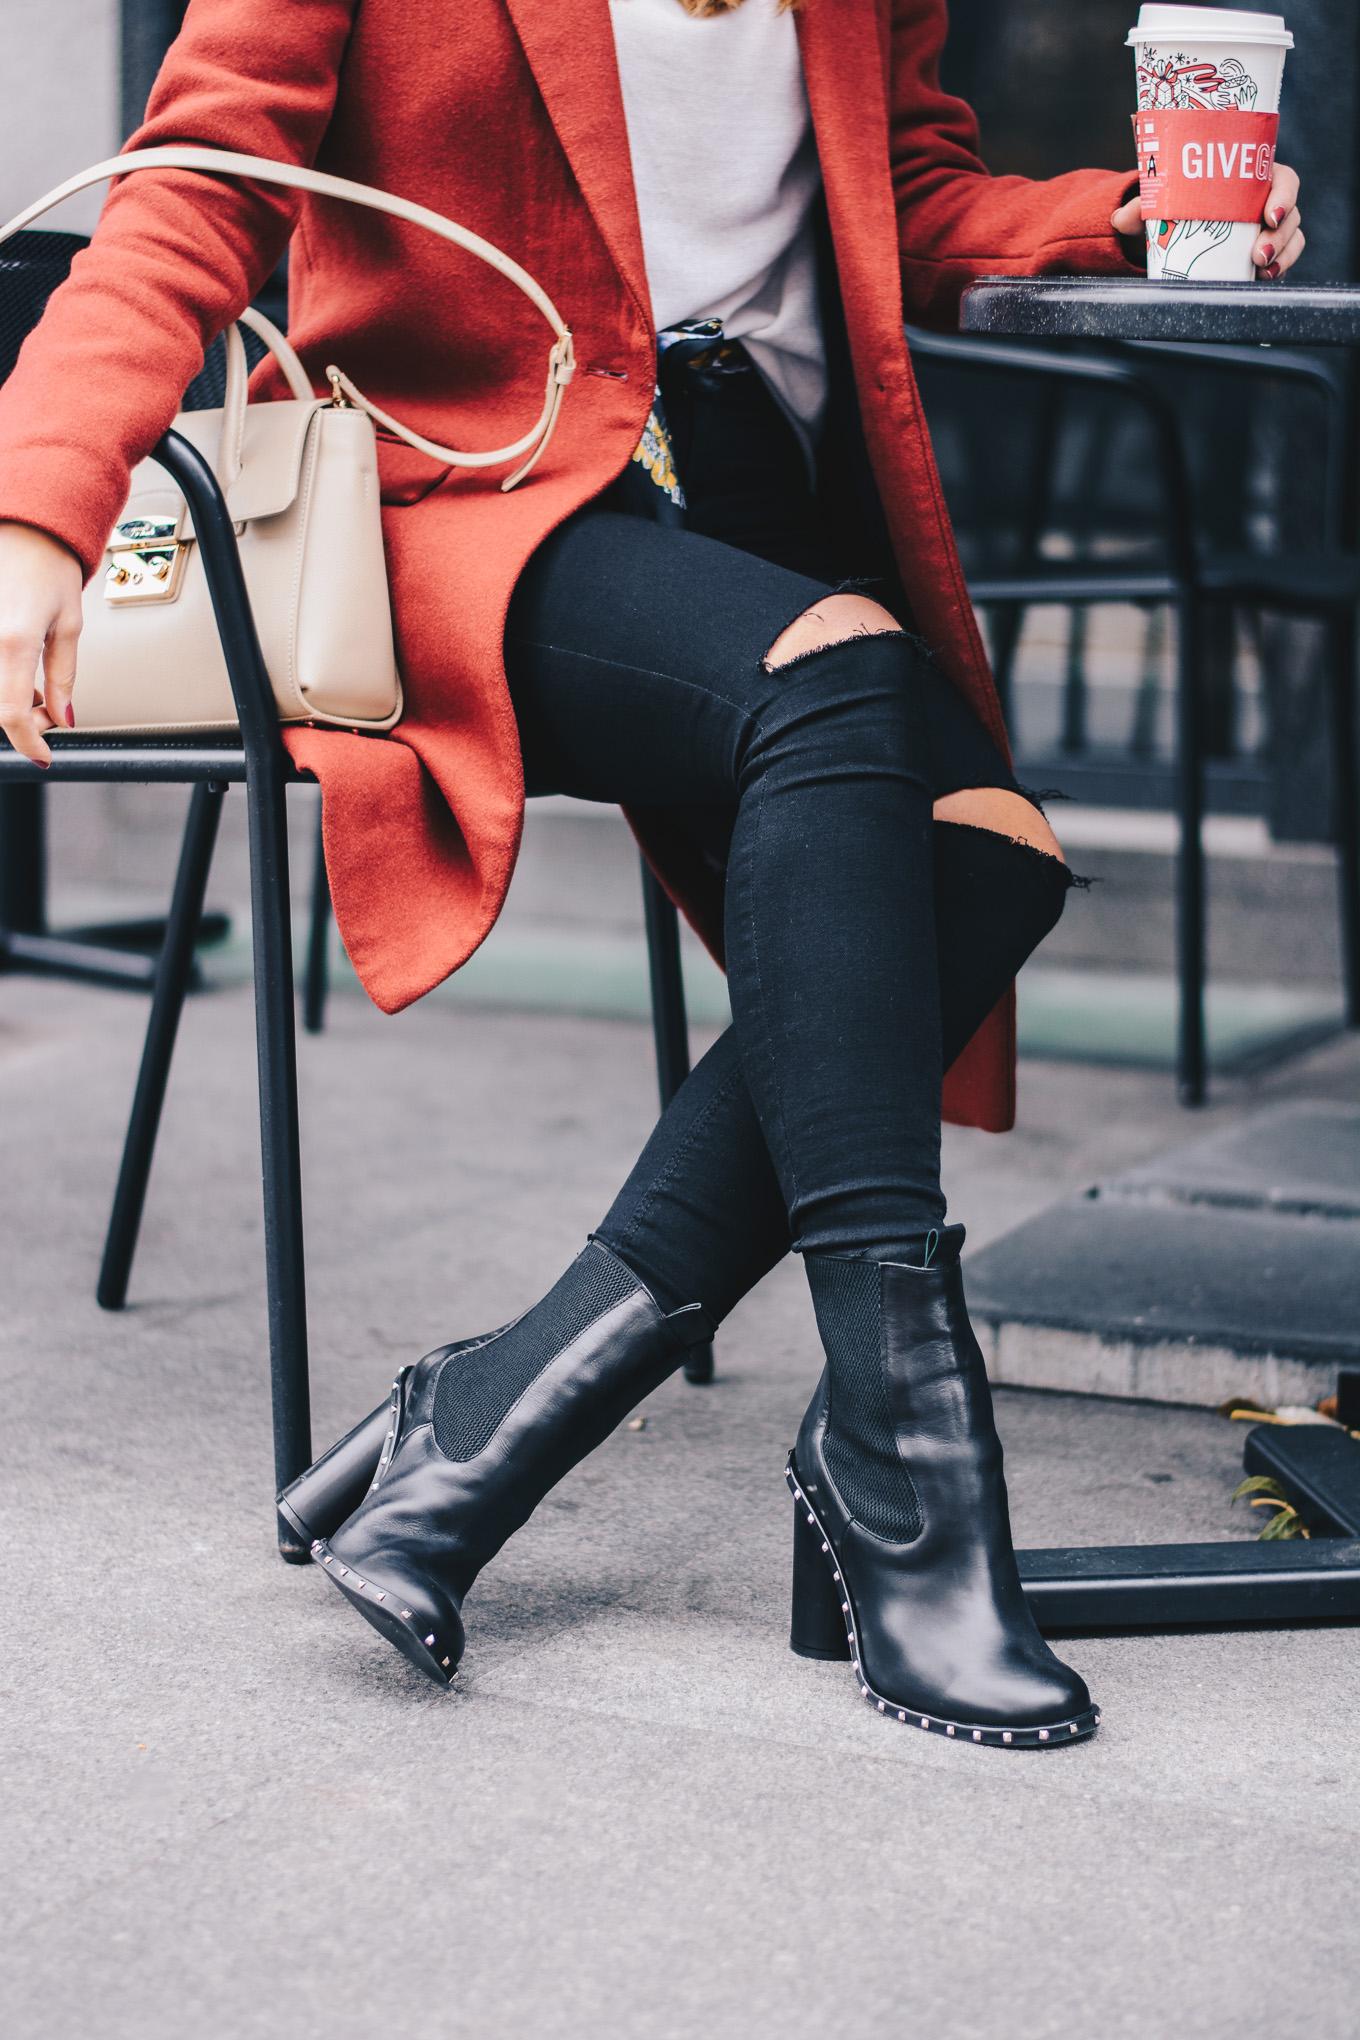 Ingiliz Selma soft leather ankle boots